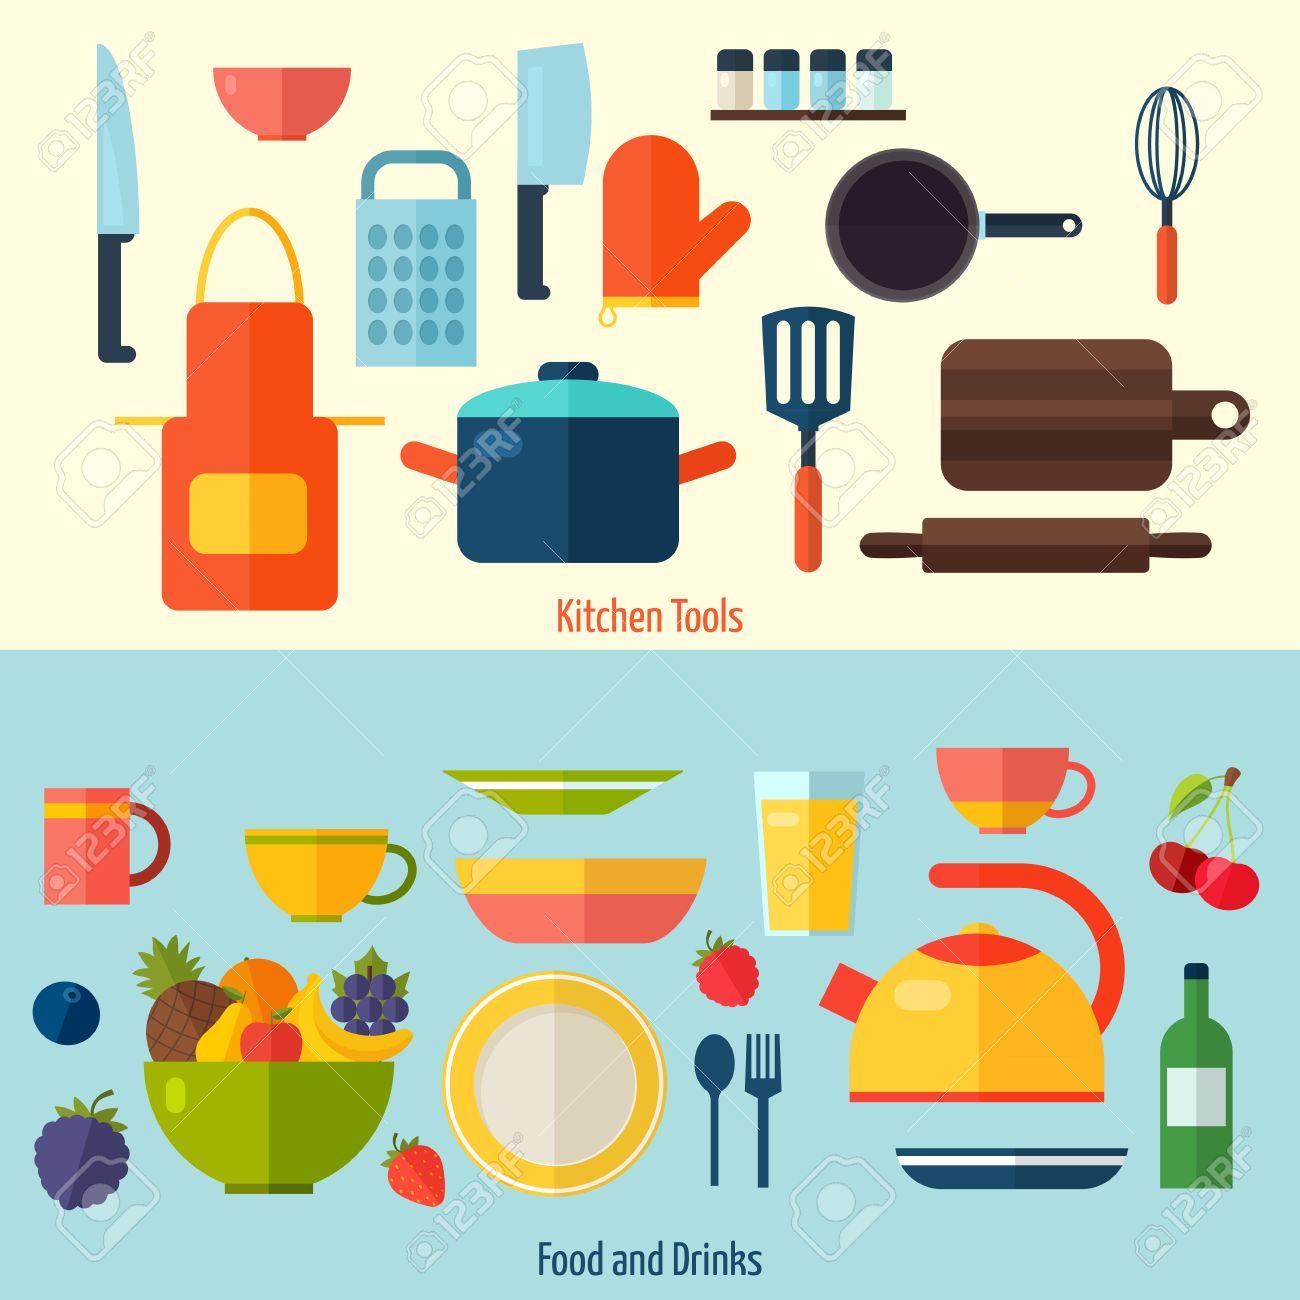 100+ [ Kitchen Tools And Equipment ] | Kitchen Equipment Wooden ...